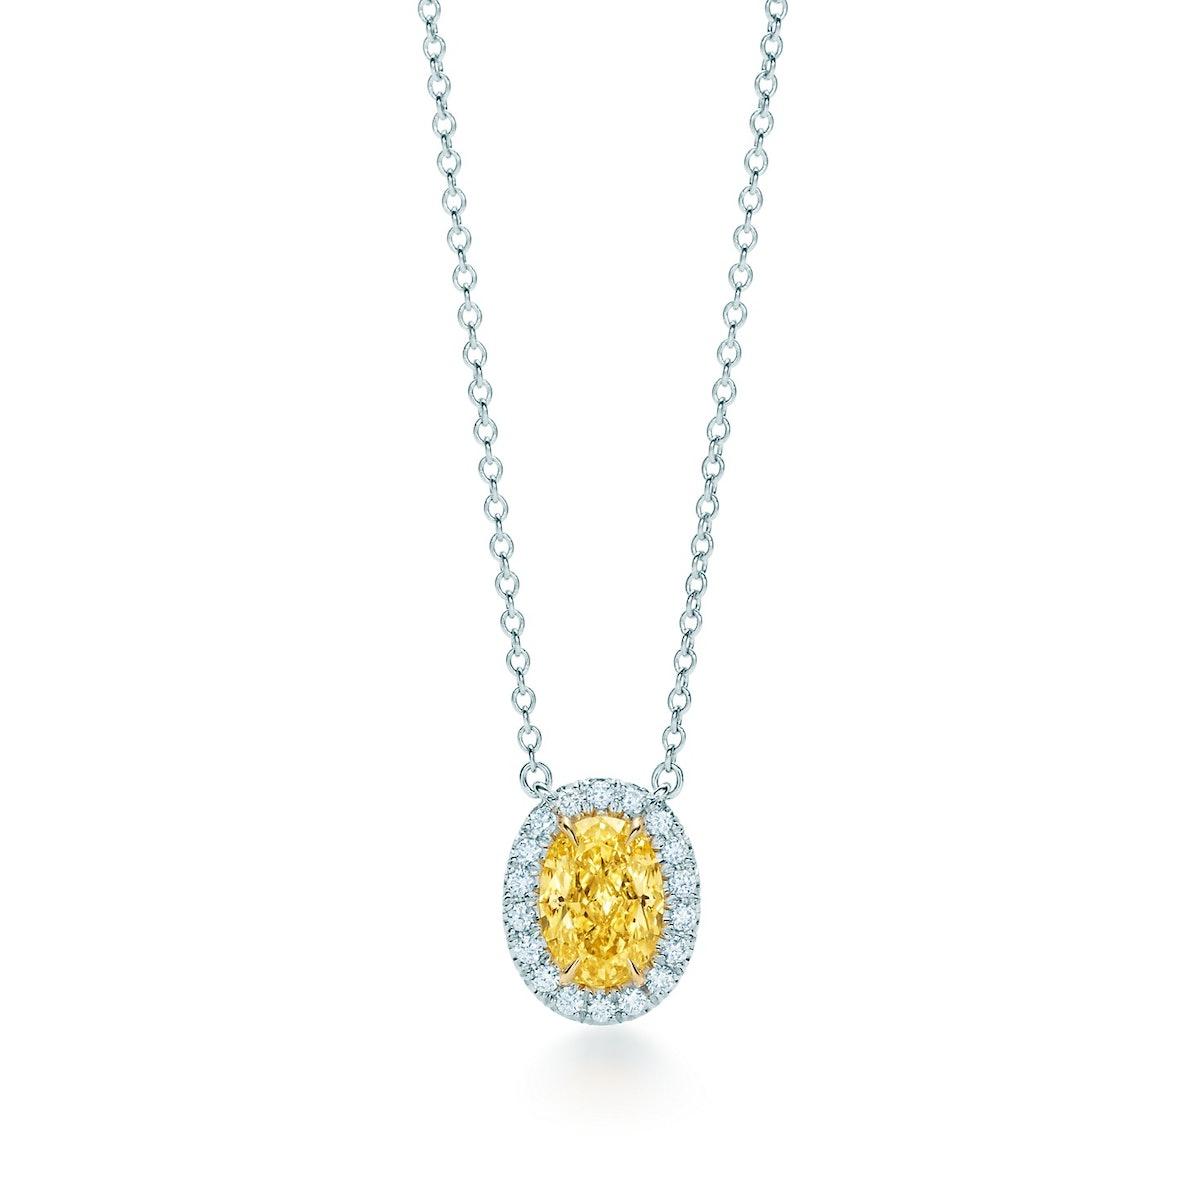 Tiffany & Co. Yellow Diamond Pendant